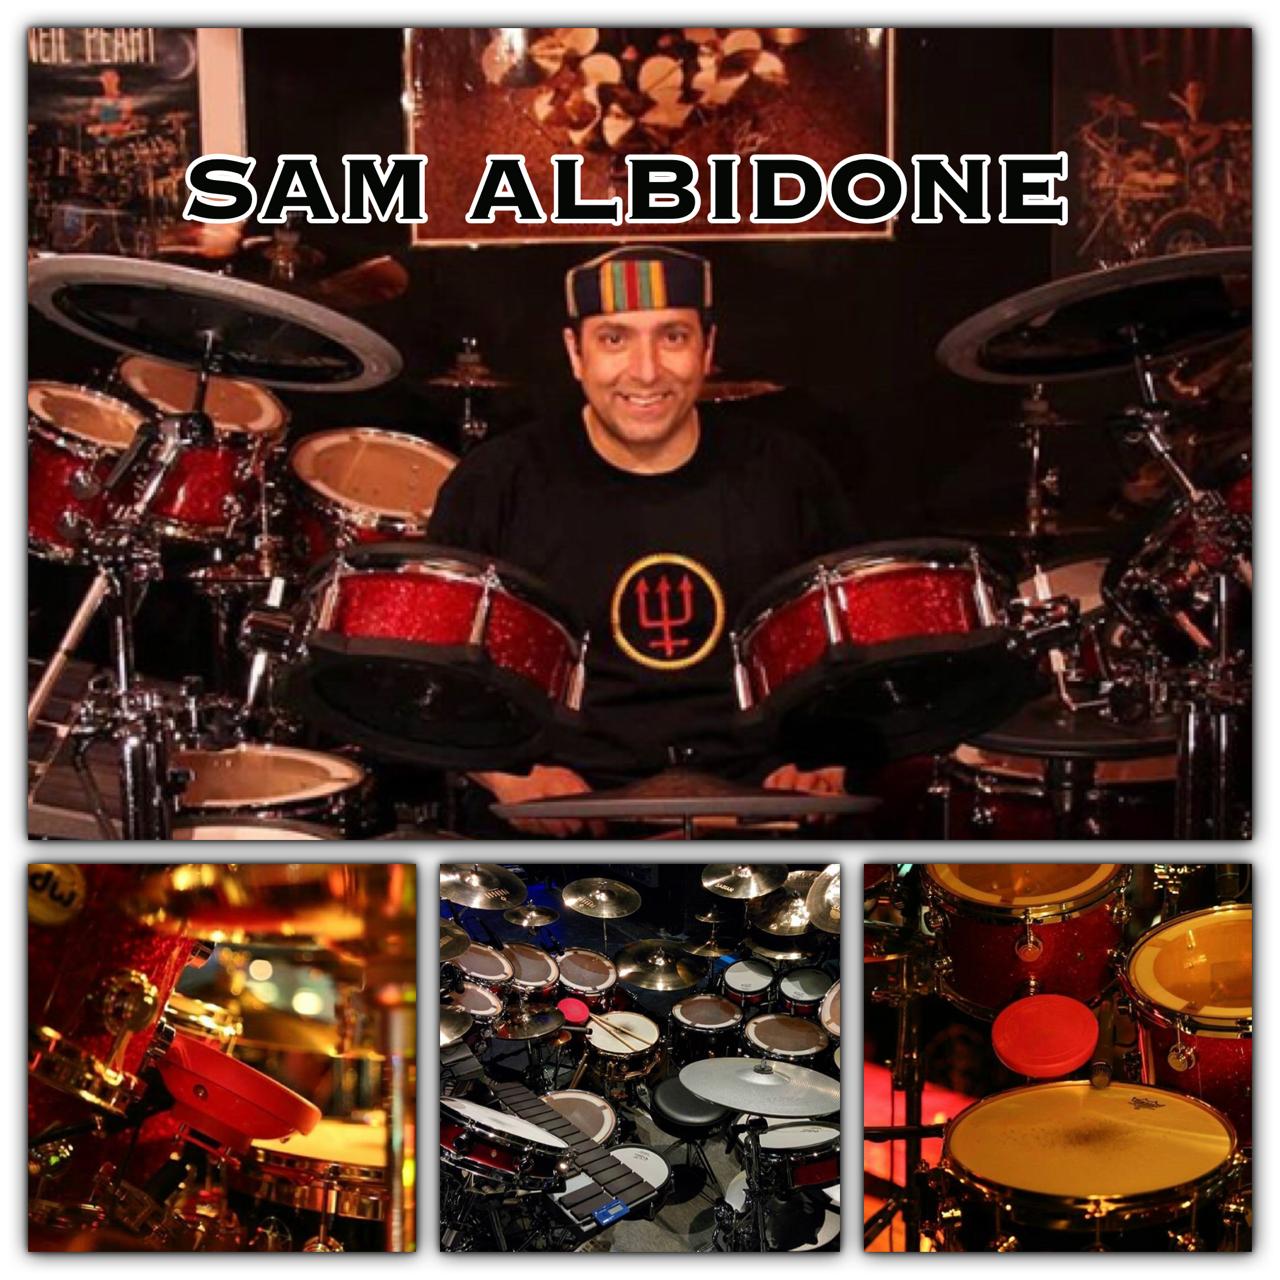 SAM ALBIDONE